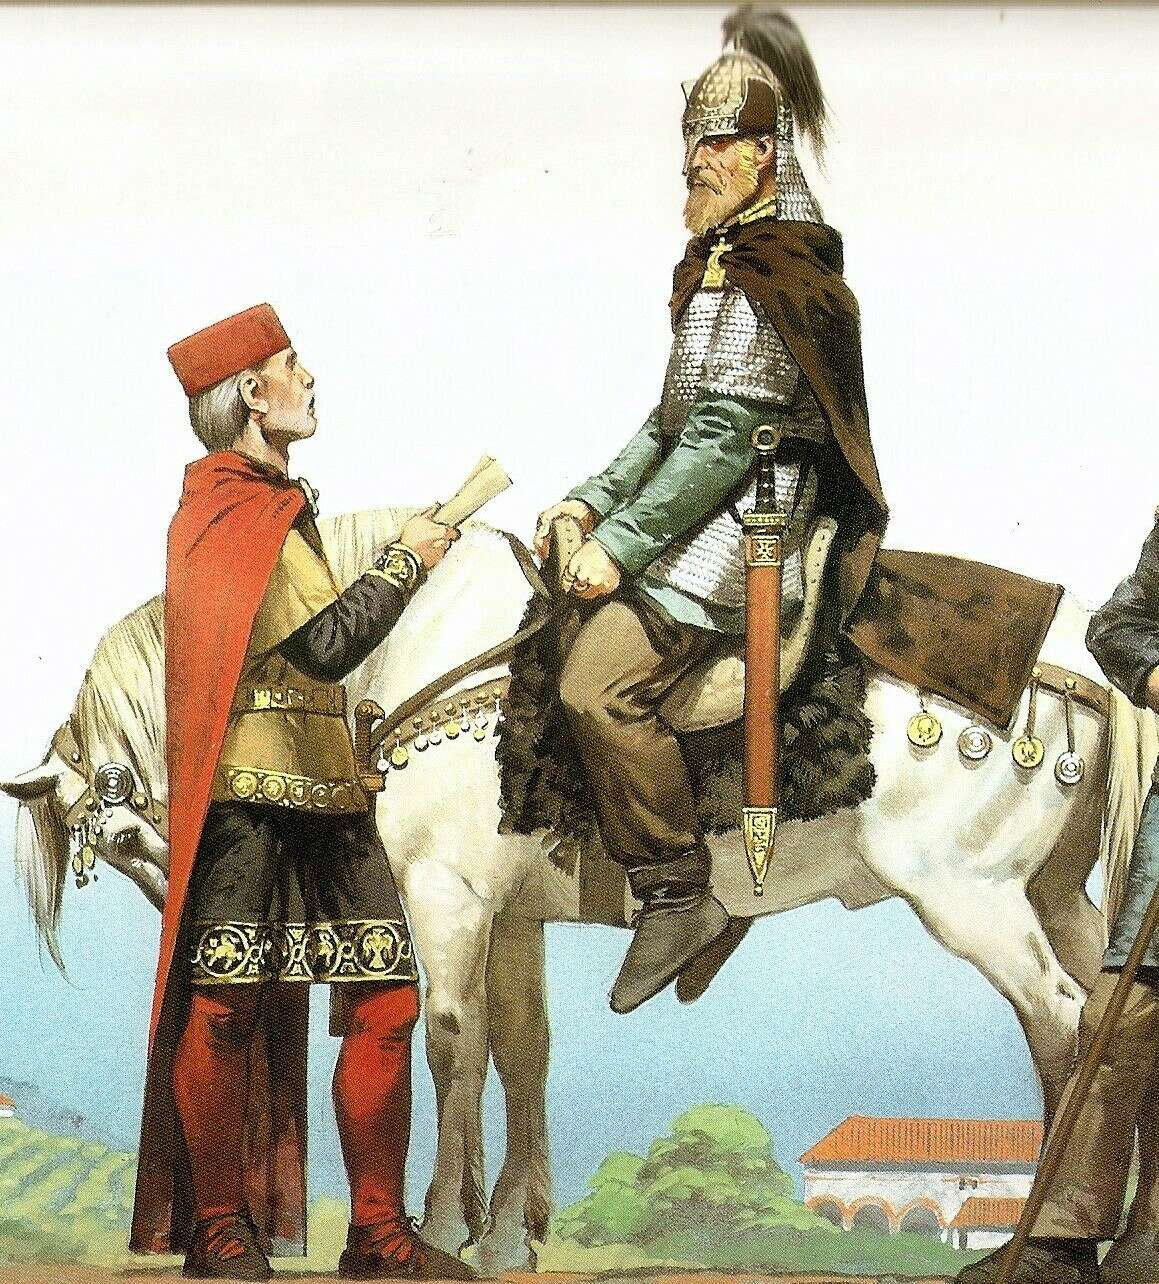 Burgundian-Warlord-Late-5th-Century-by-Angus-McBride (1) (1).jpg